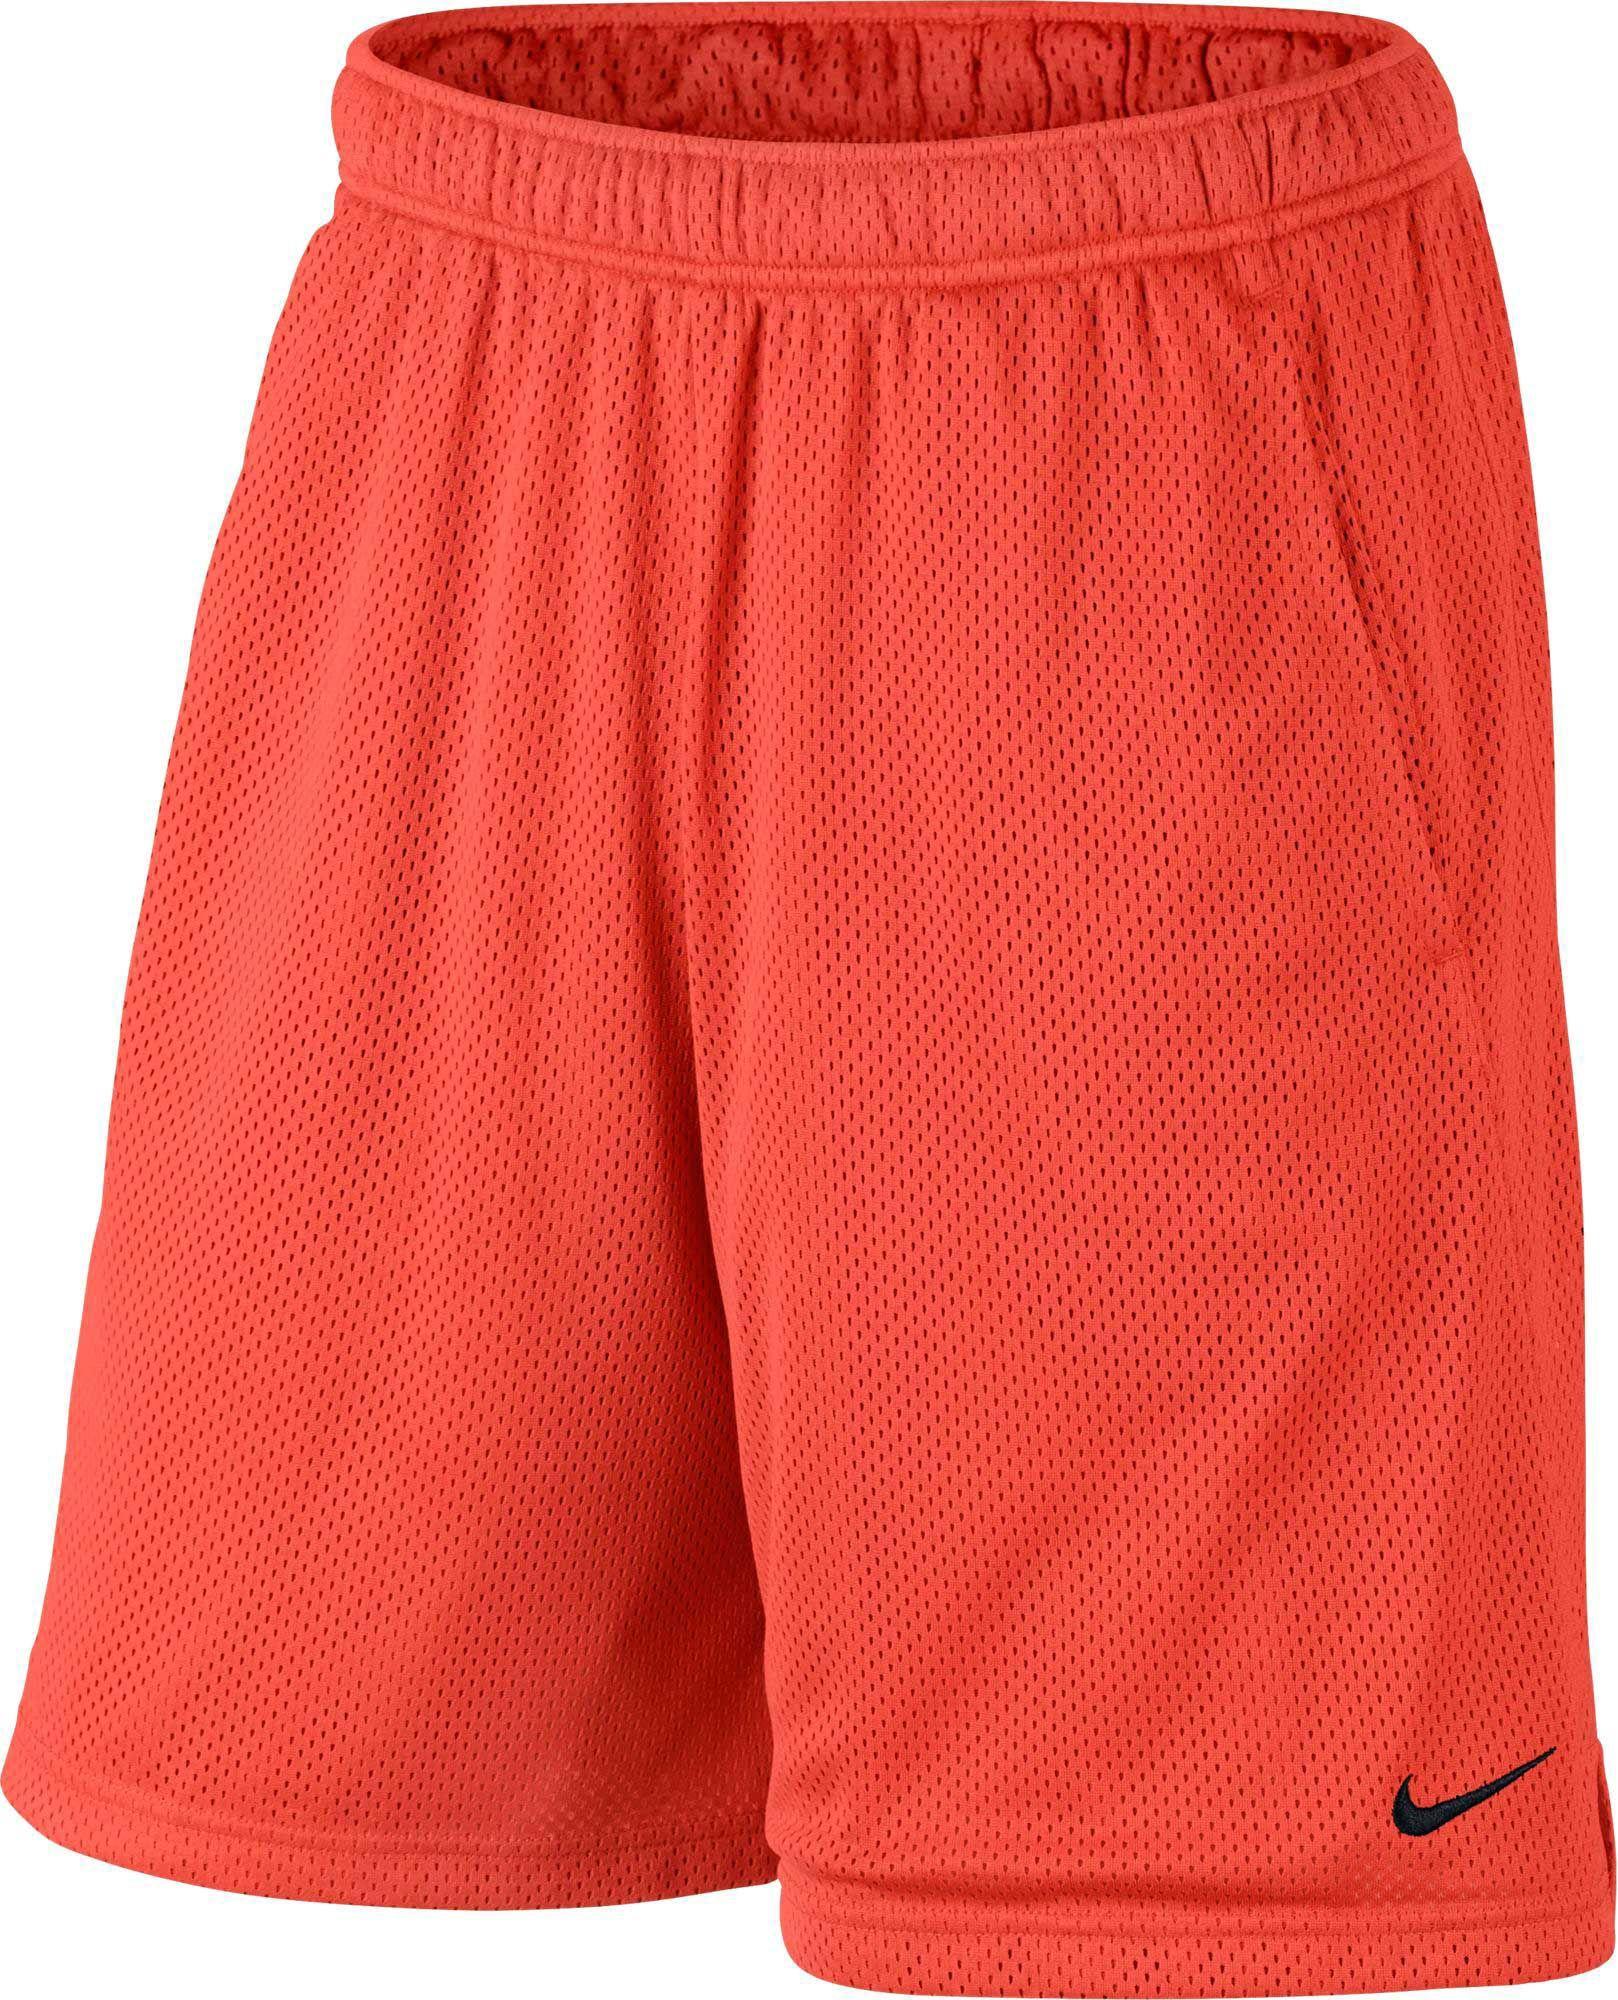 ac82f631b6 Nike Men's 9'' Dry Monster Mesh Shorts, Size: Medium, Max Orange/Black